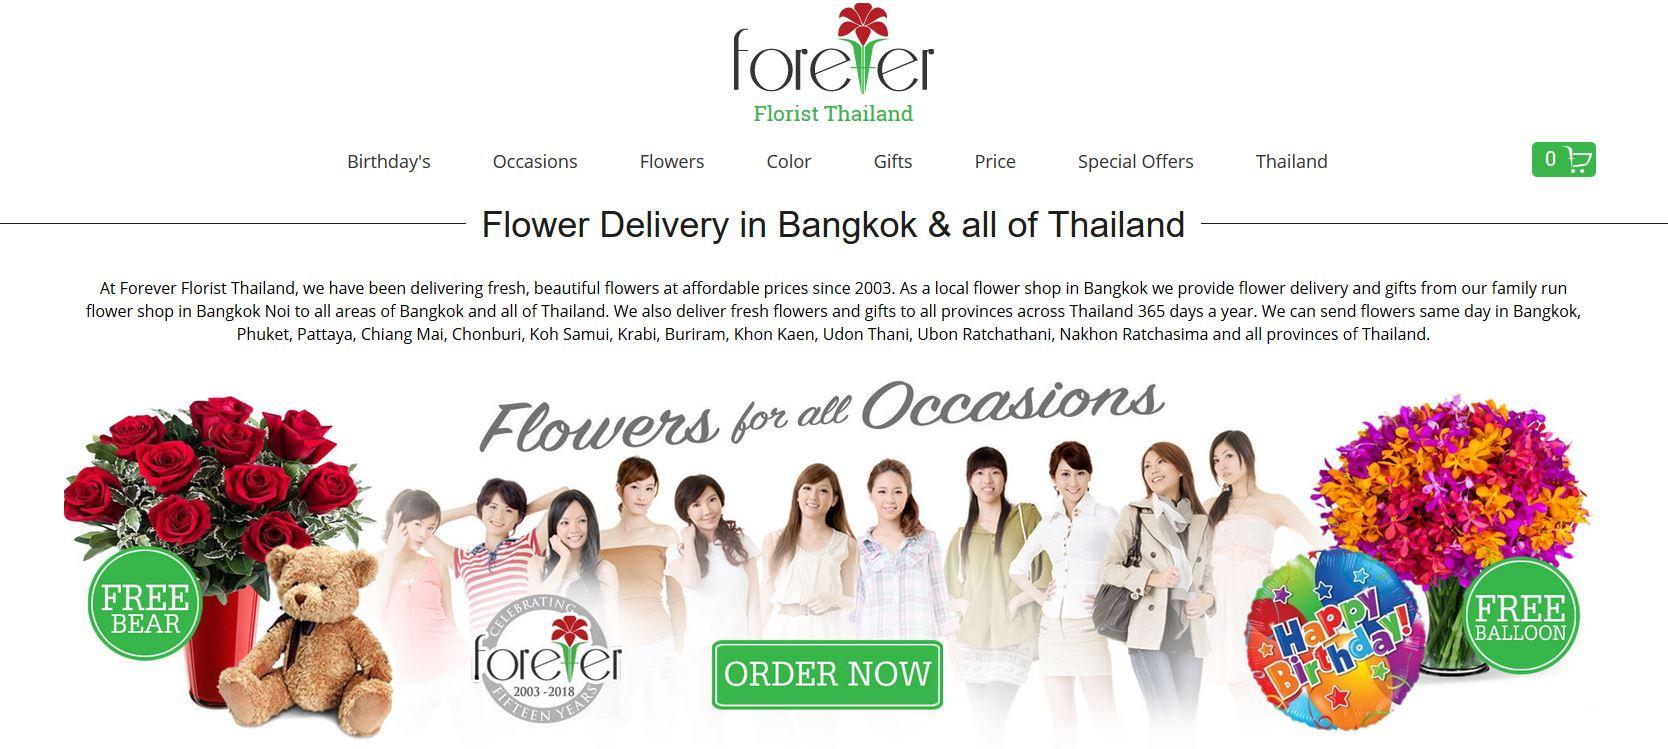 forever-florist-thailand